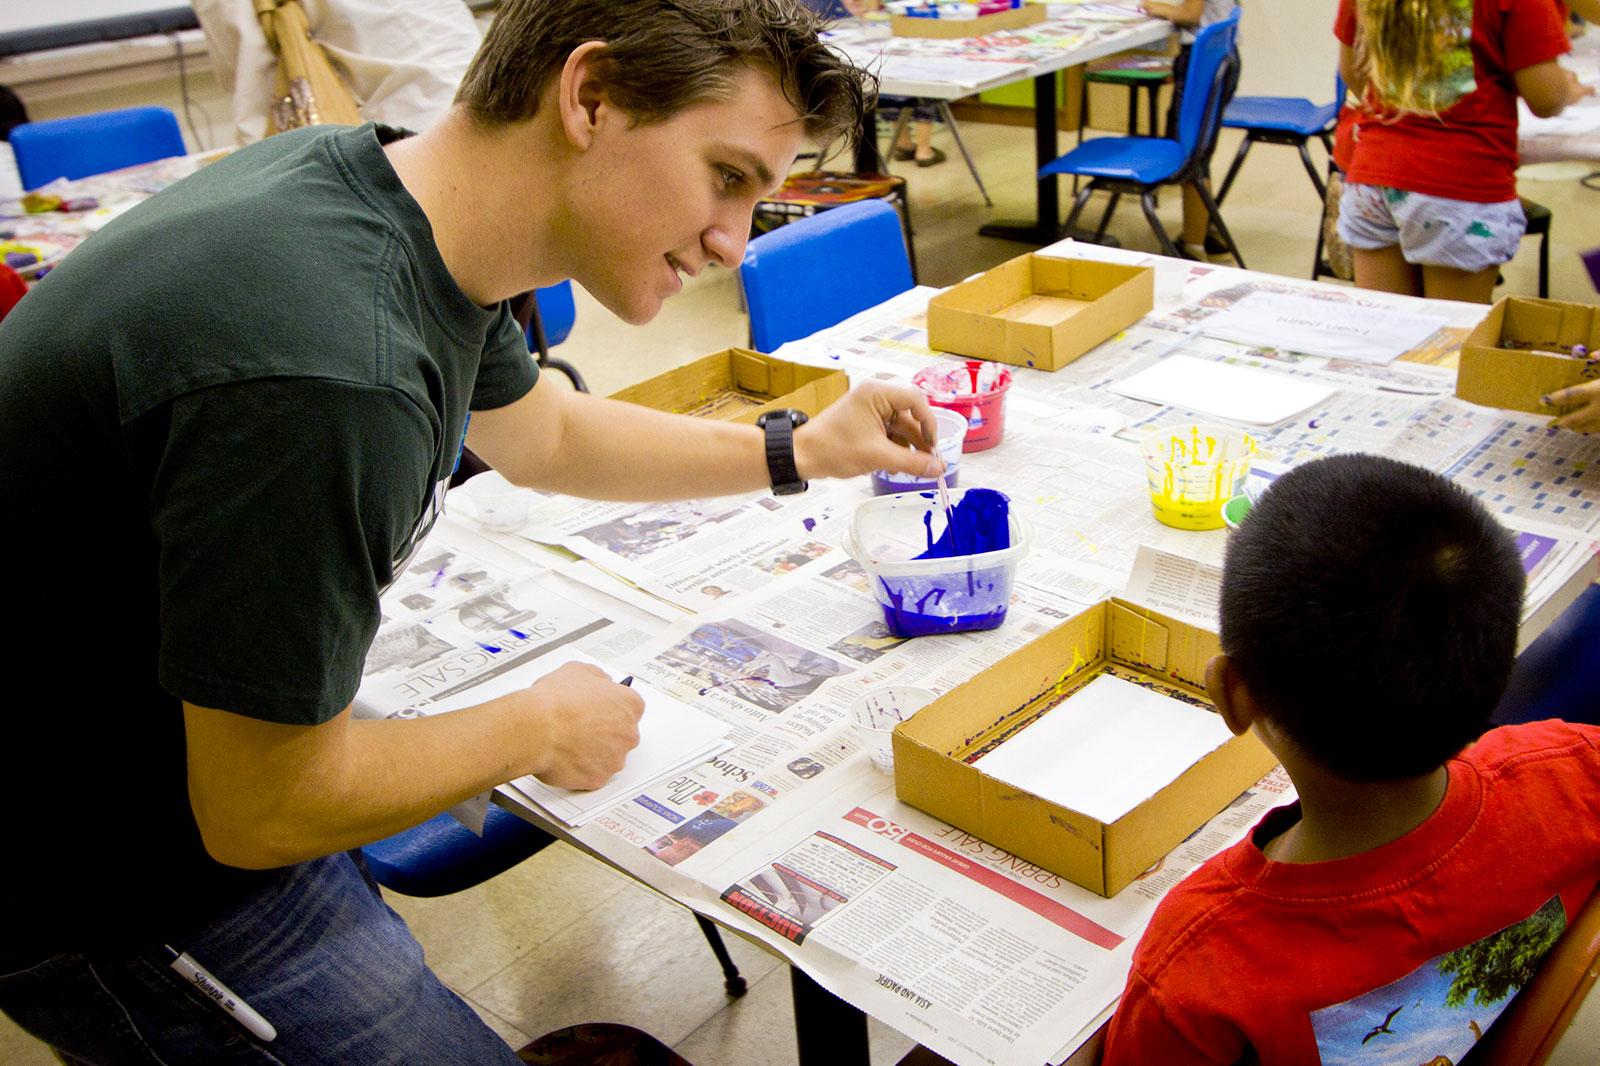 Elementary education student teaching child